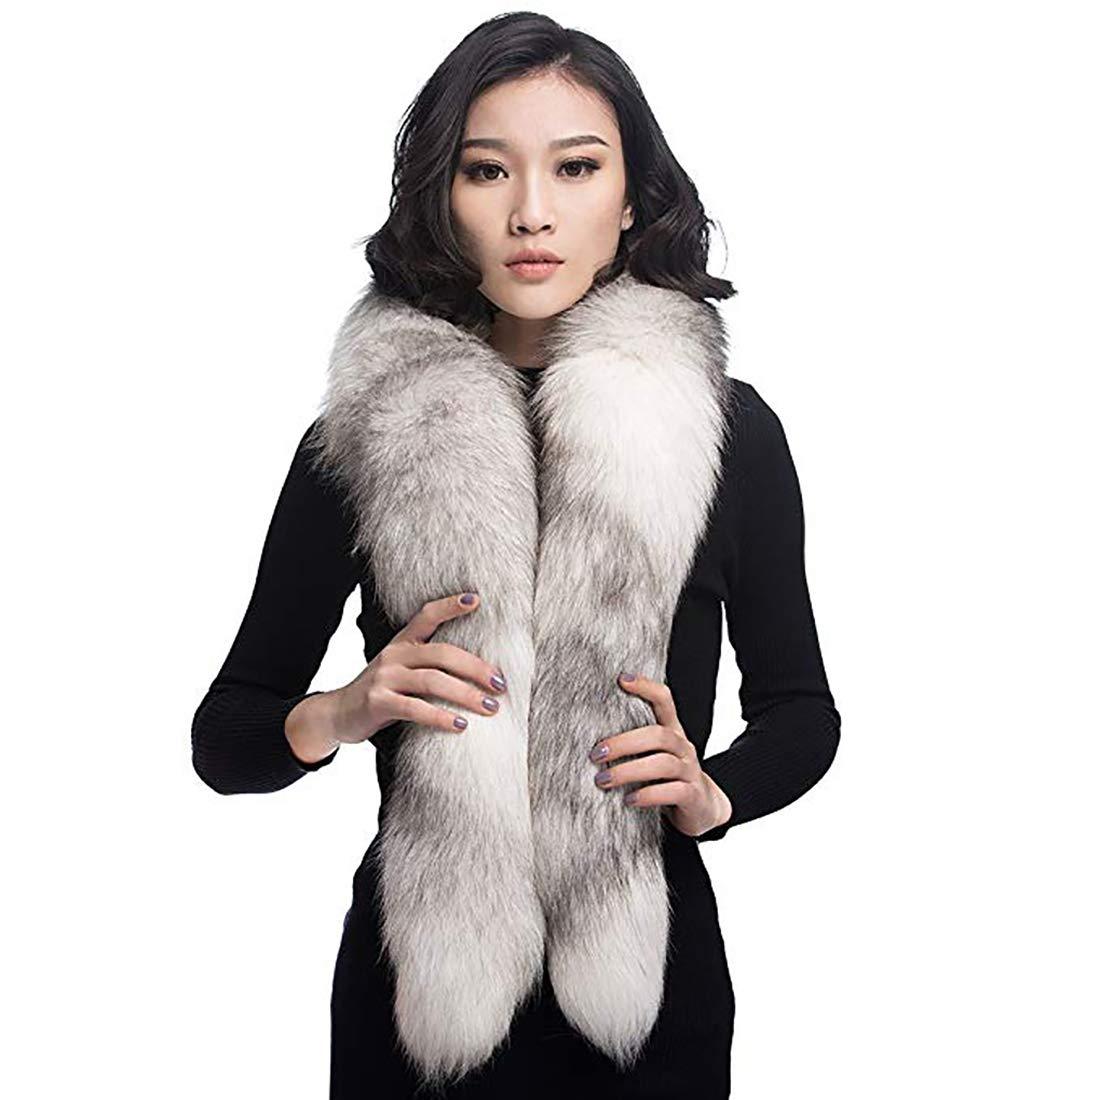 URSFUR Fox Fur Boa Scarf, Women Real Fox Fur Scarf Collar Warm Neck Winter Fur Scarf for Coat